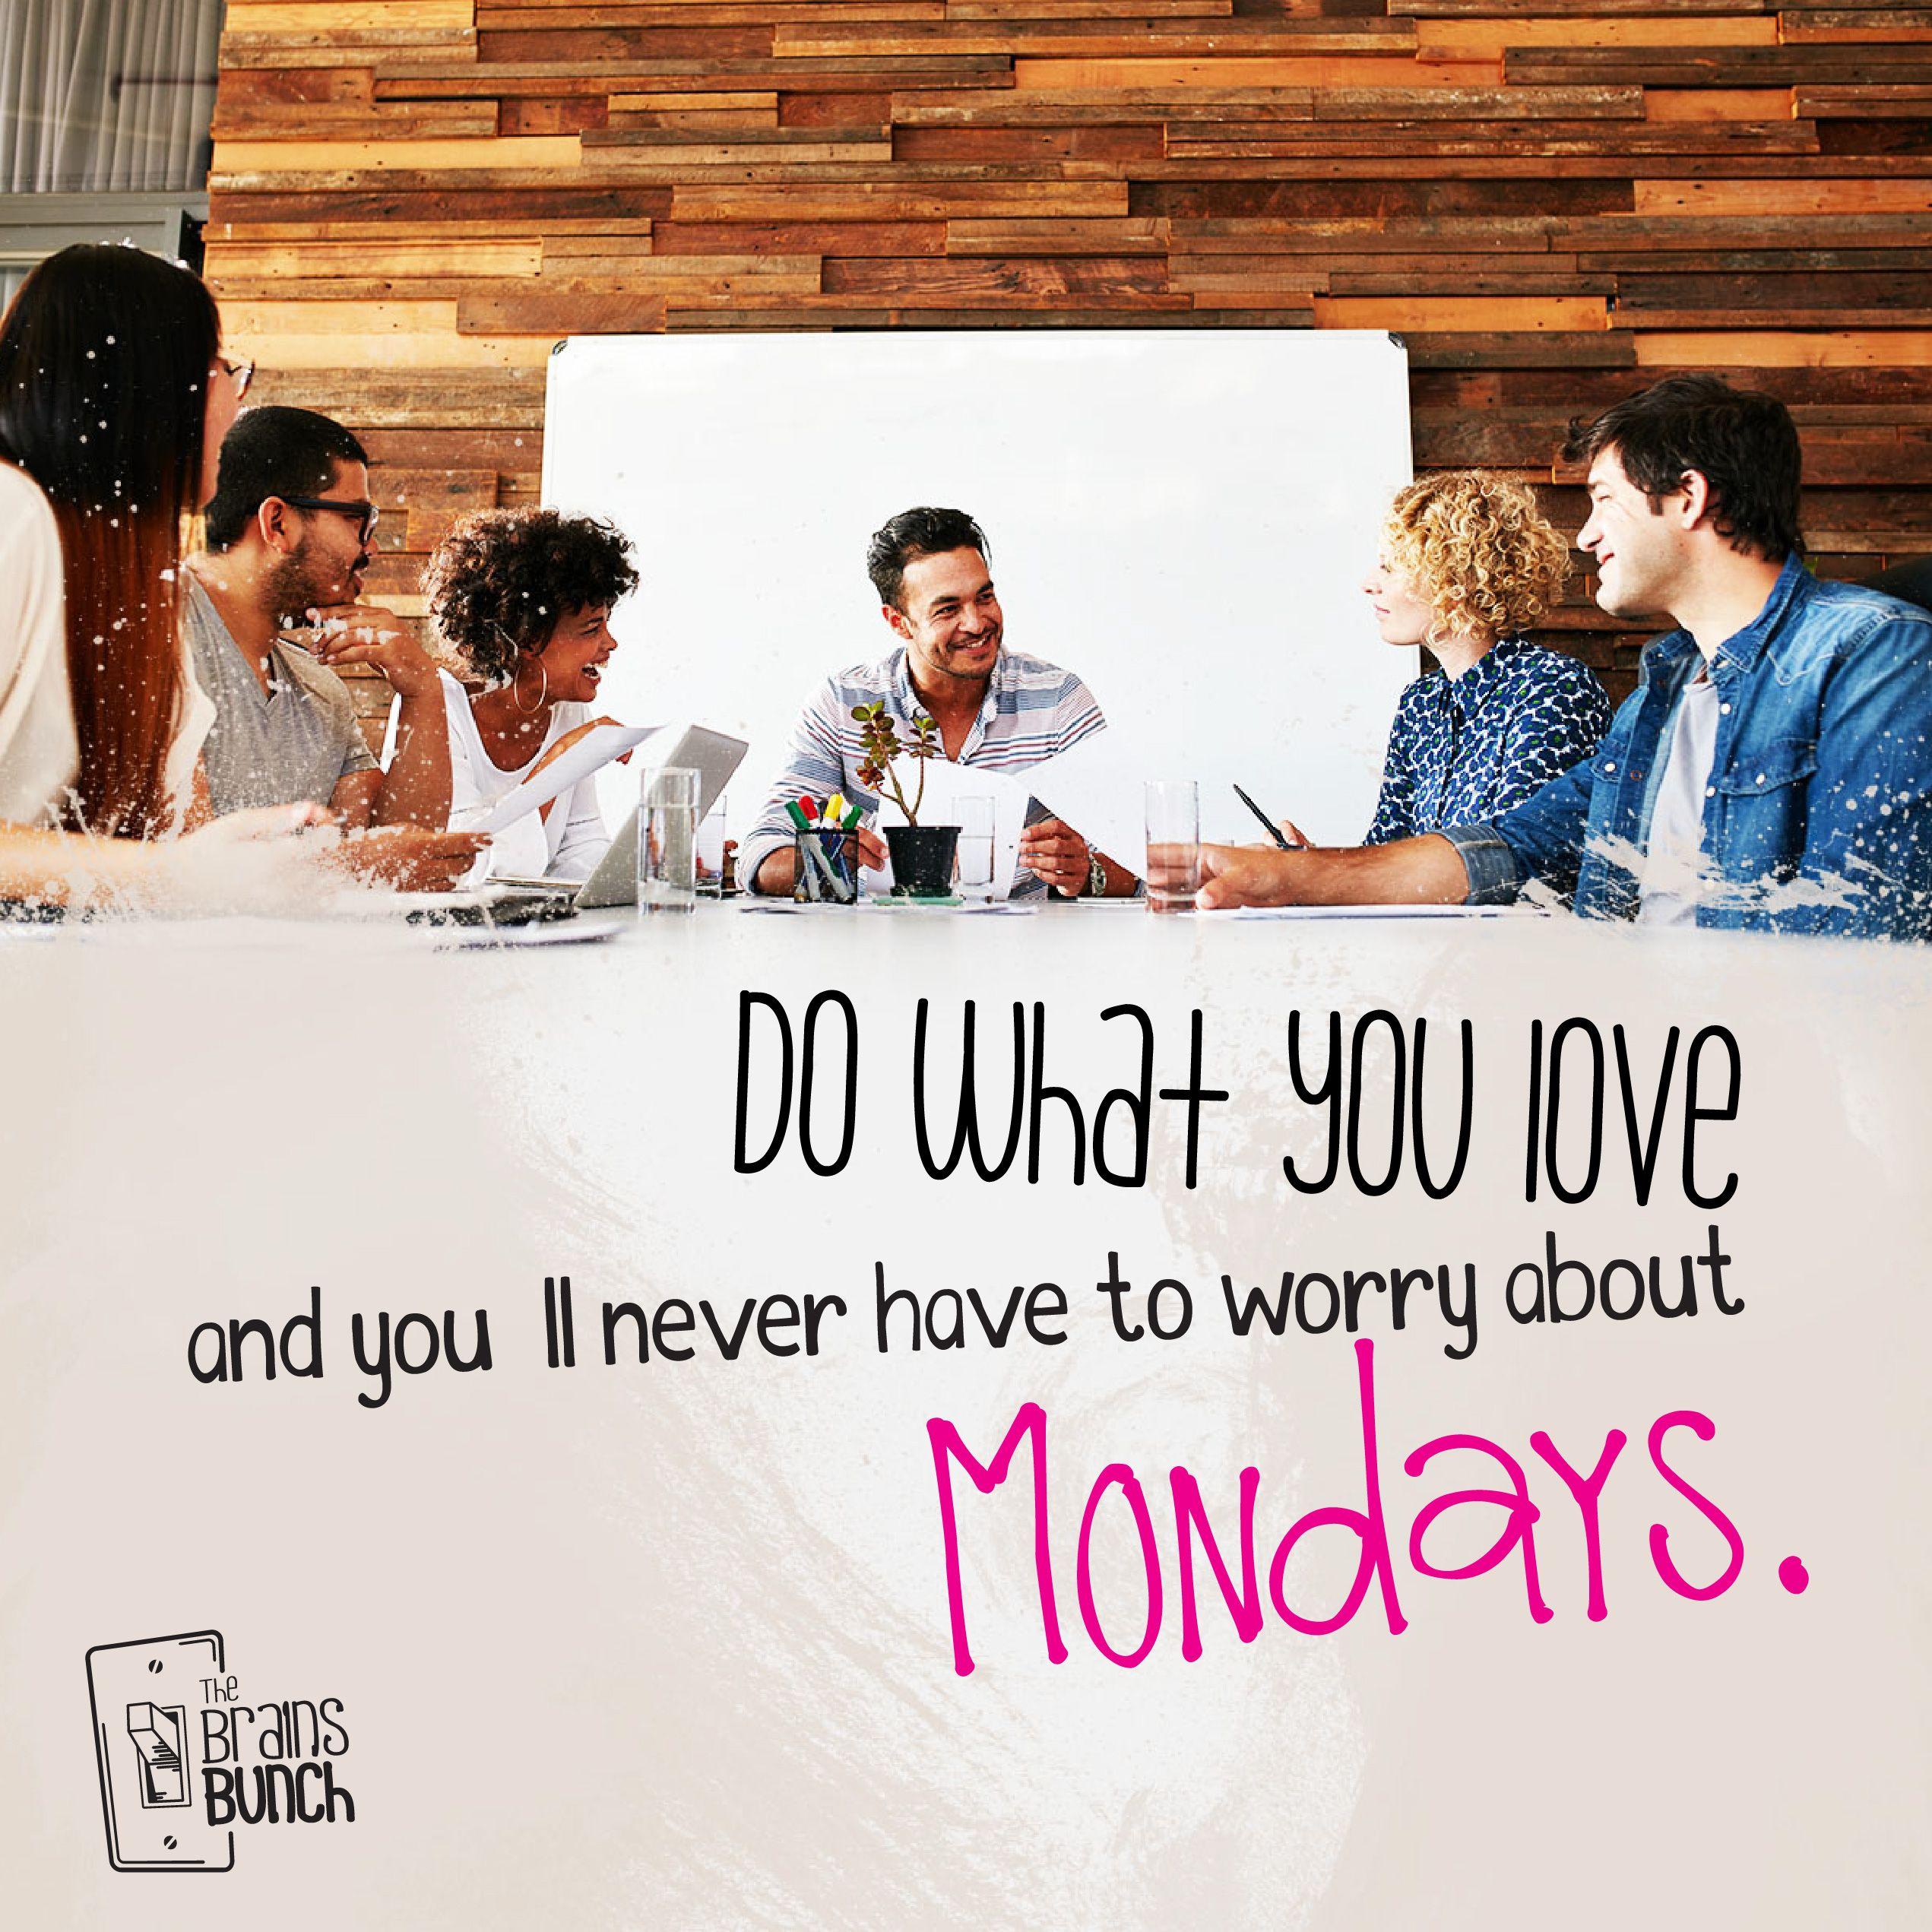 Do what you love and you´ll never have to worry about Mondays. Think about it! ;) #HappyMonday | Haz lo que amas y nunca tendrás que preocuparte por los lunes. ¡Piénsalo! #FelizLunes   #TheBunchOfSages #entrepreneur #creative #success #quote #inspiration